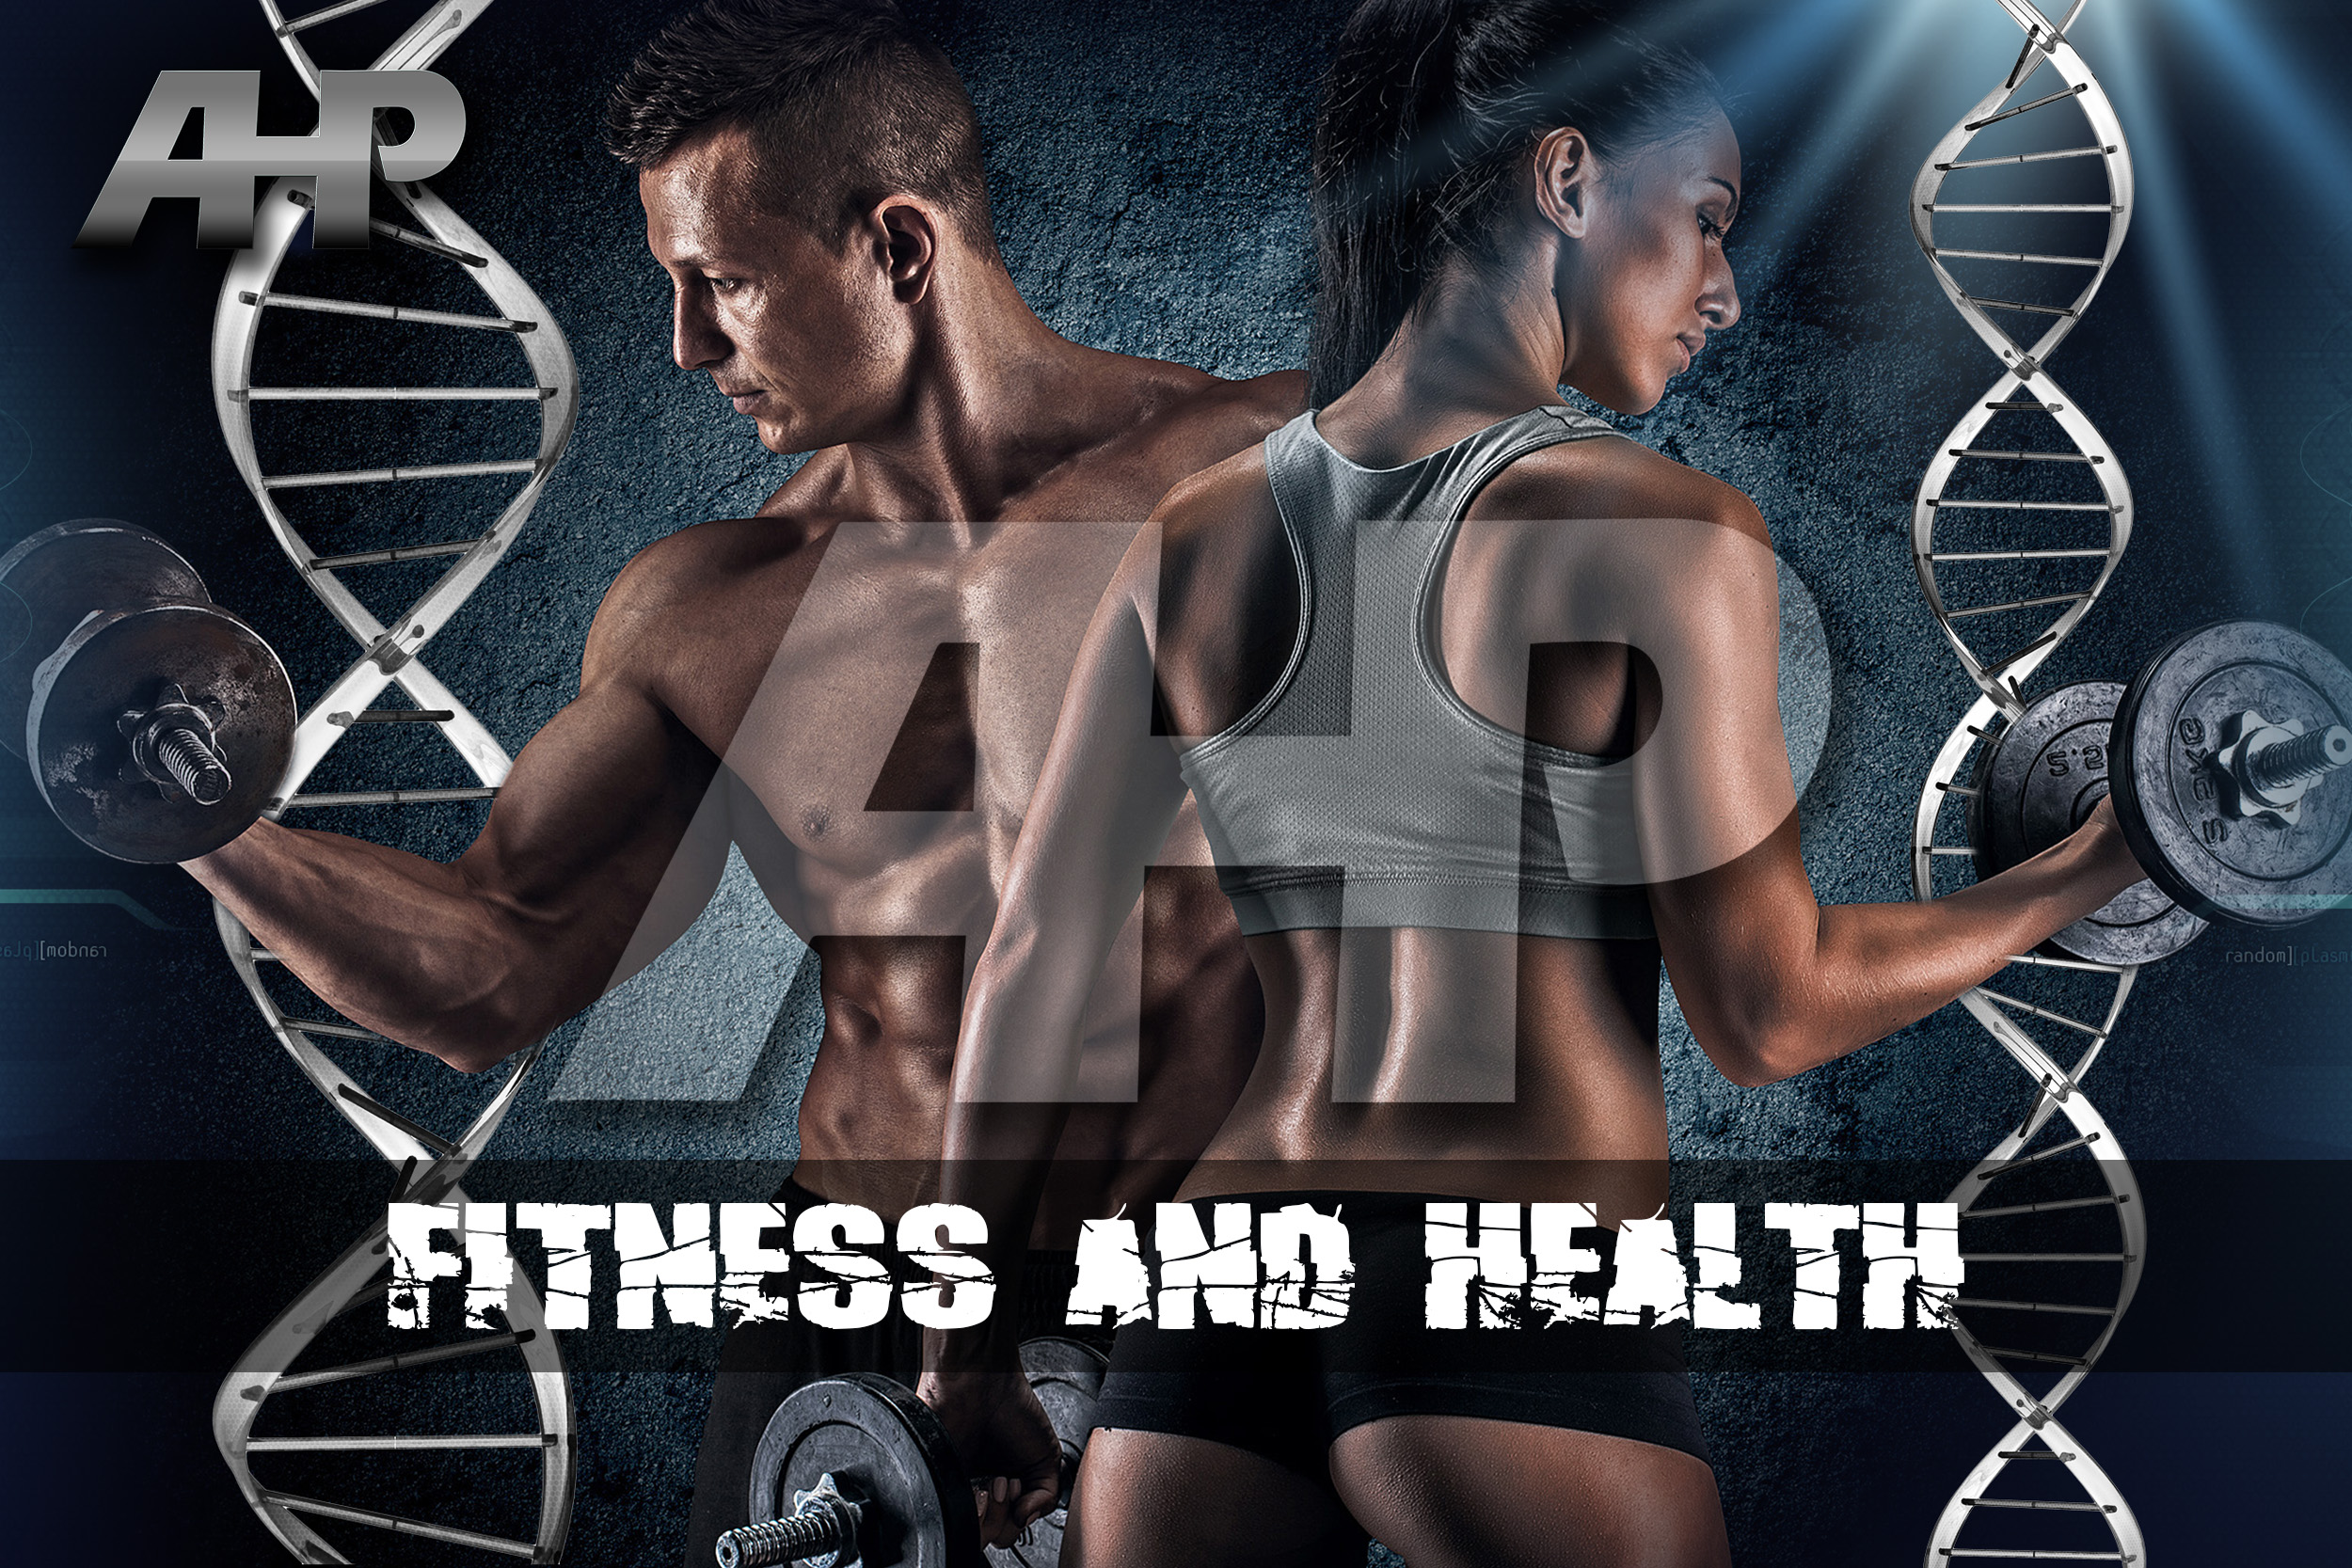 Fitness & Health Training (AHP).jpg